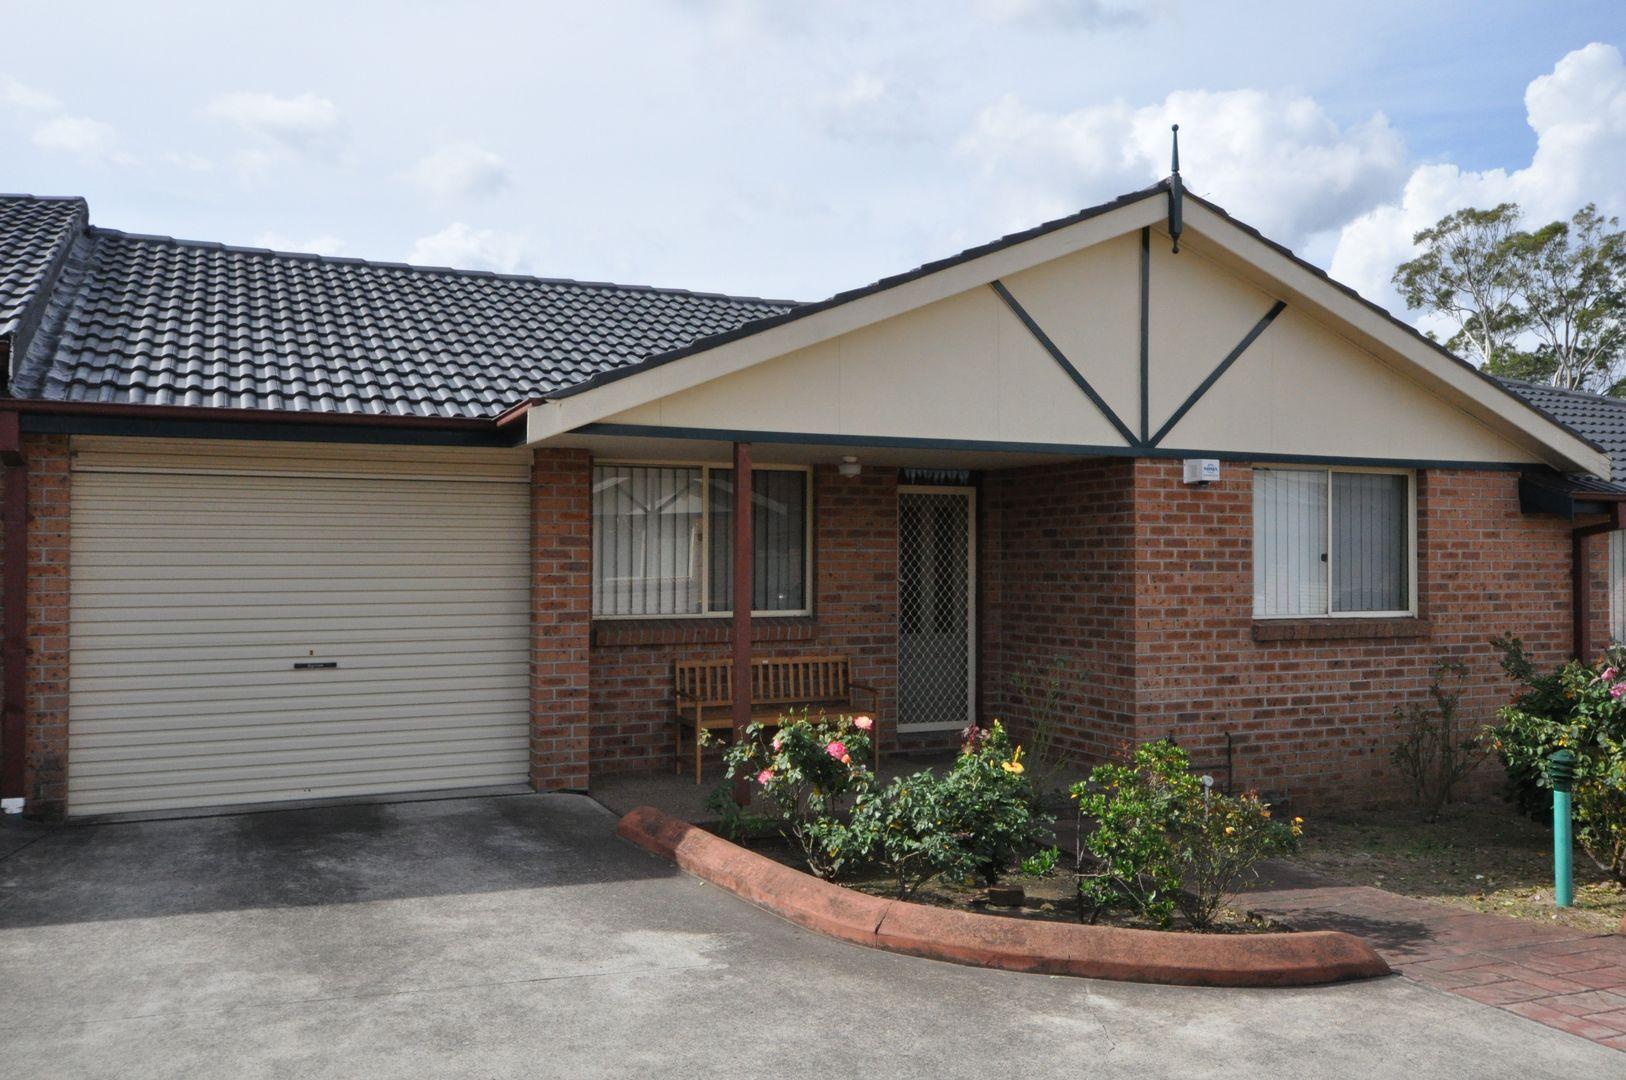 9/177-179 Targo Road, Girraween NSW 2145, Image 0